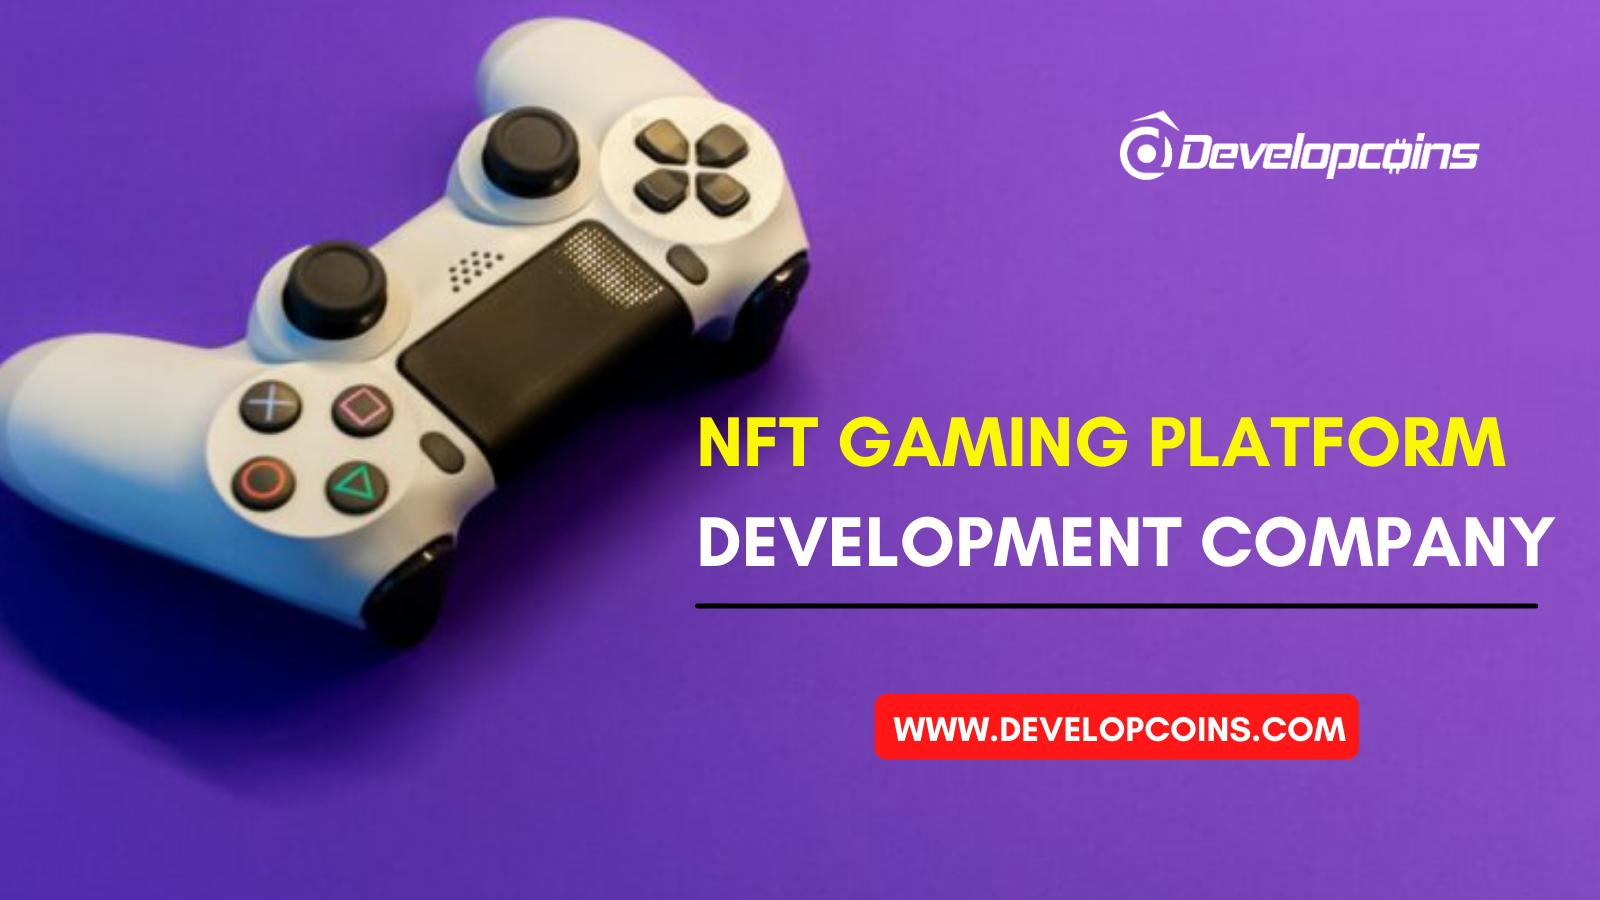 NFT Gaming Platform Development Company | NFT Game Development Services